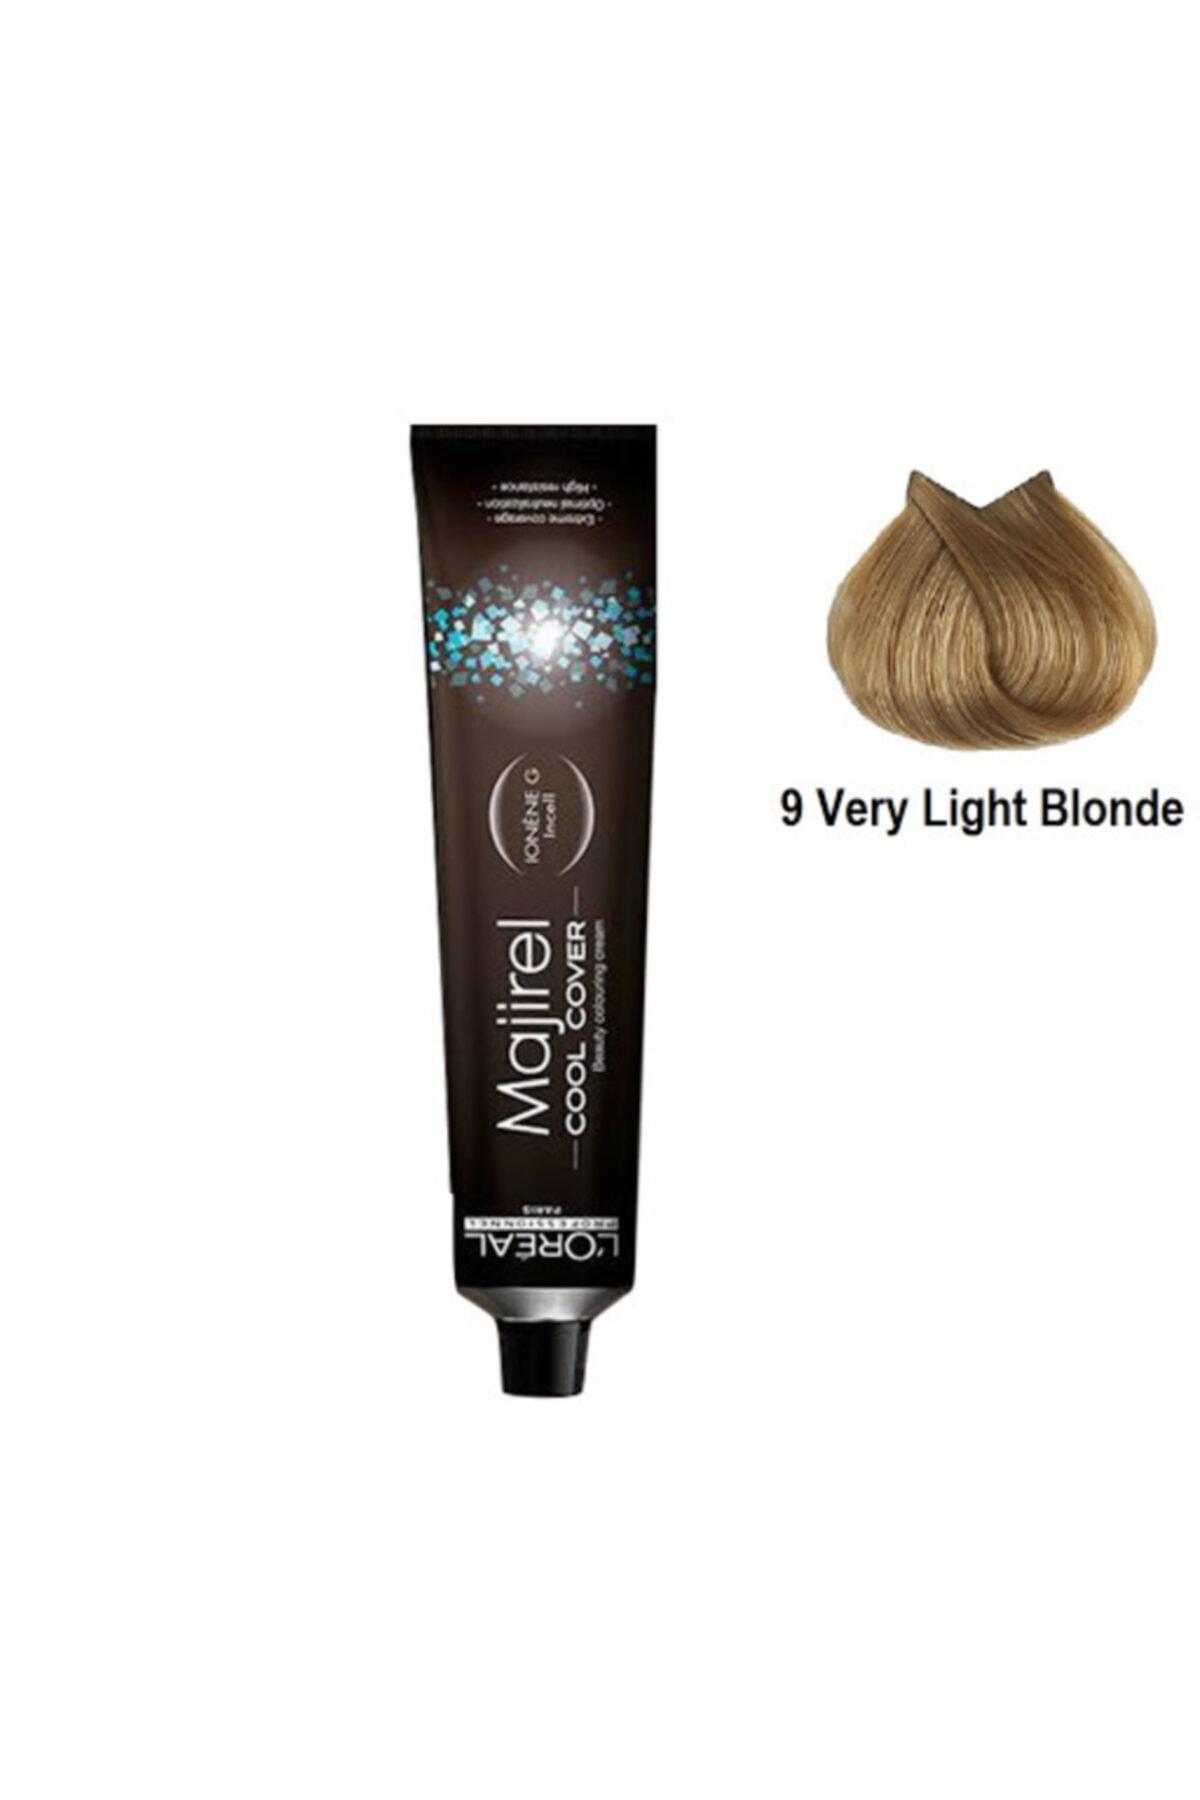 L'oreal Professionnel Majirel Cool Cover Cc 9 Very Light Blonde 50 ml 1